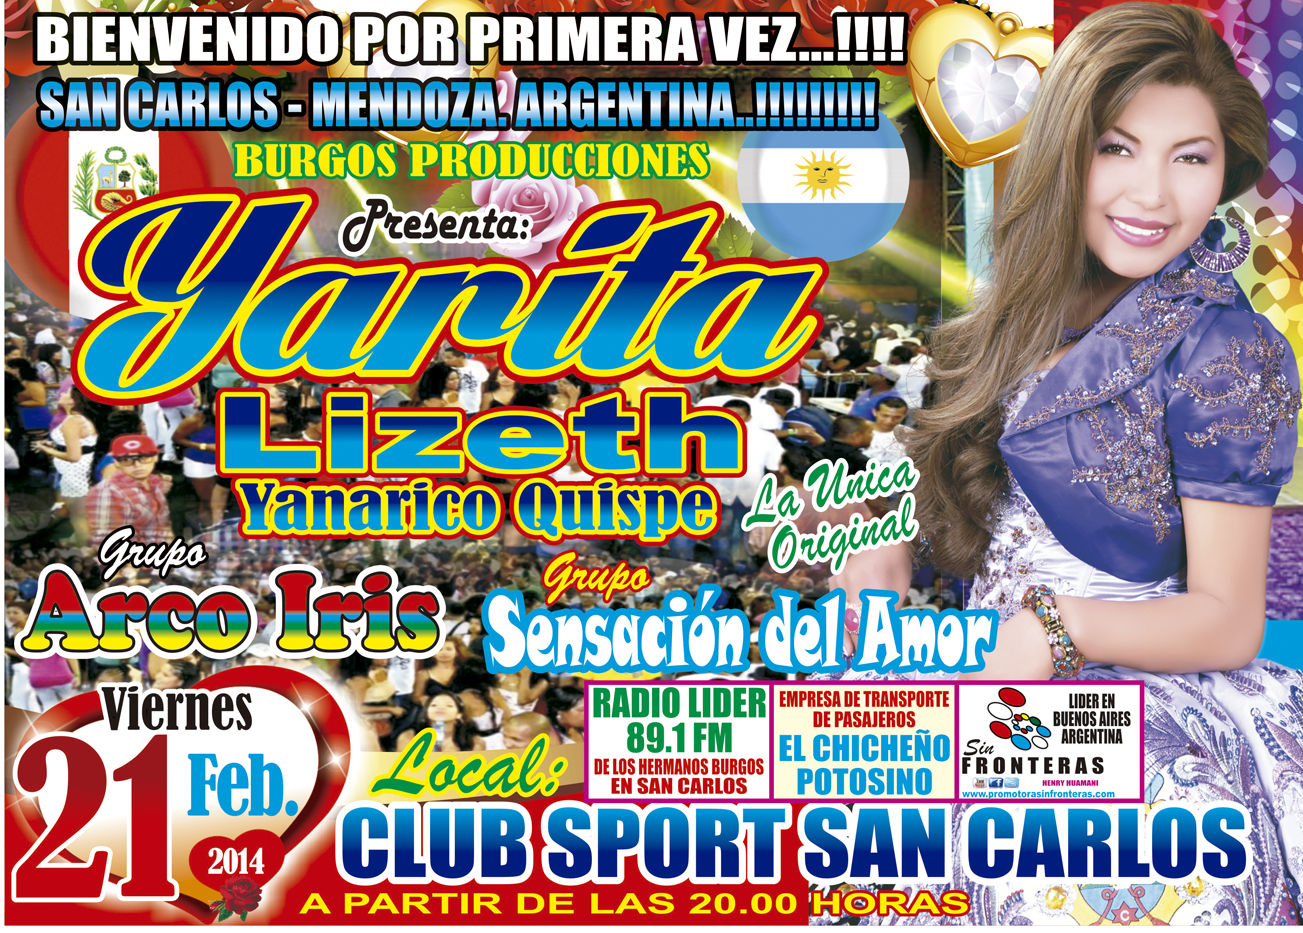 http://promotorasinfronteras.com#